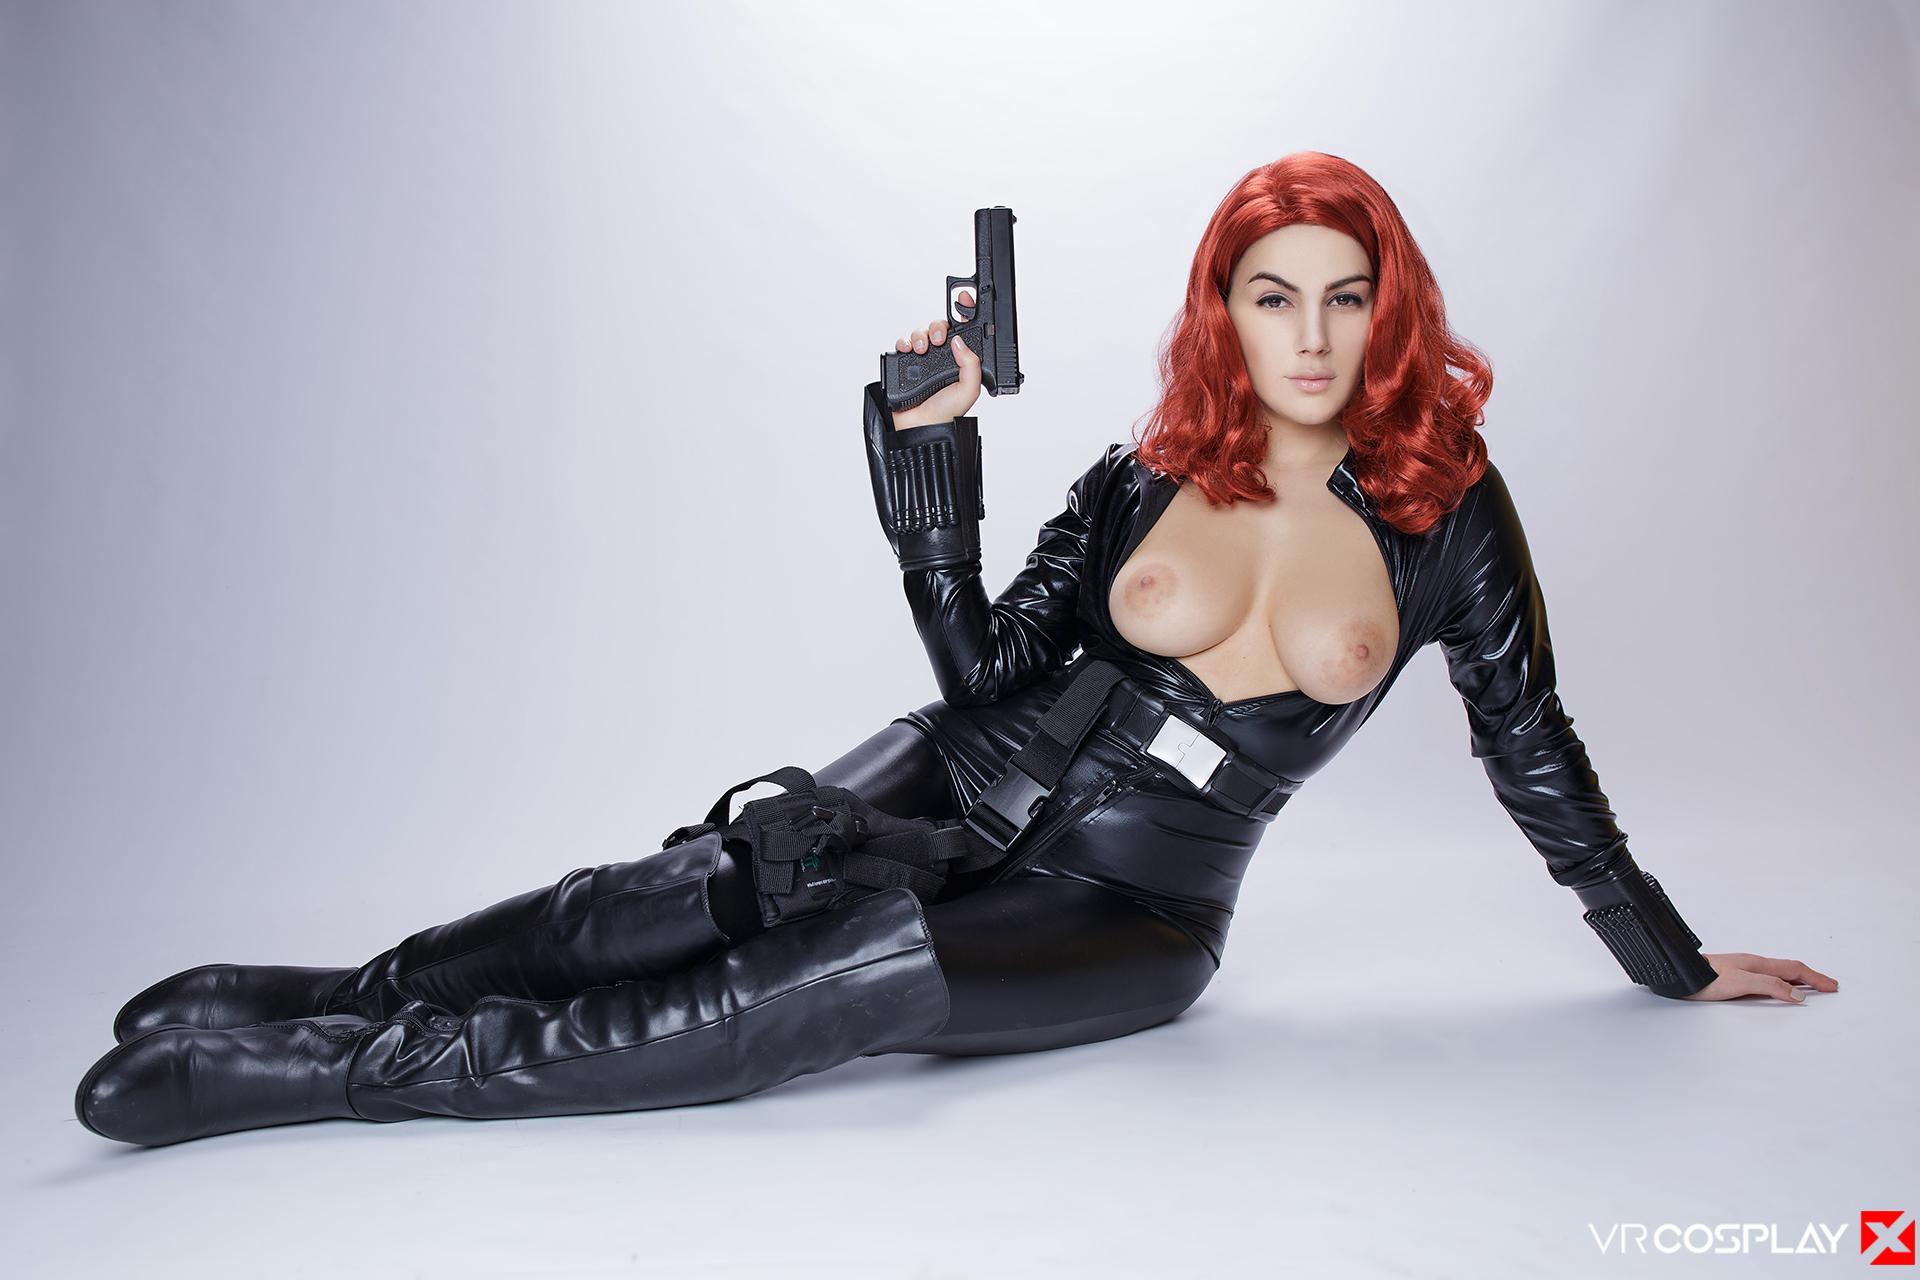 Valentina nappi cosplays and sex as tifa lockhart ff7 7